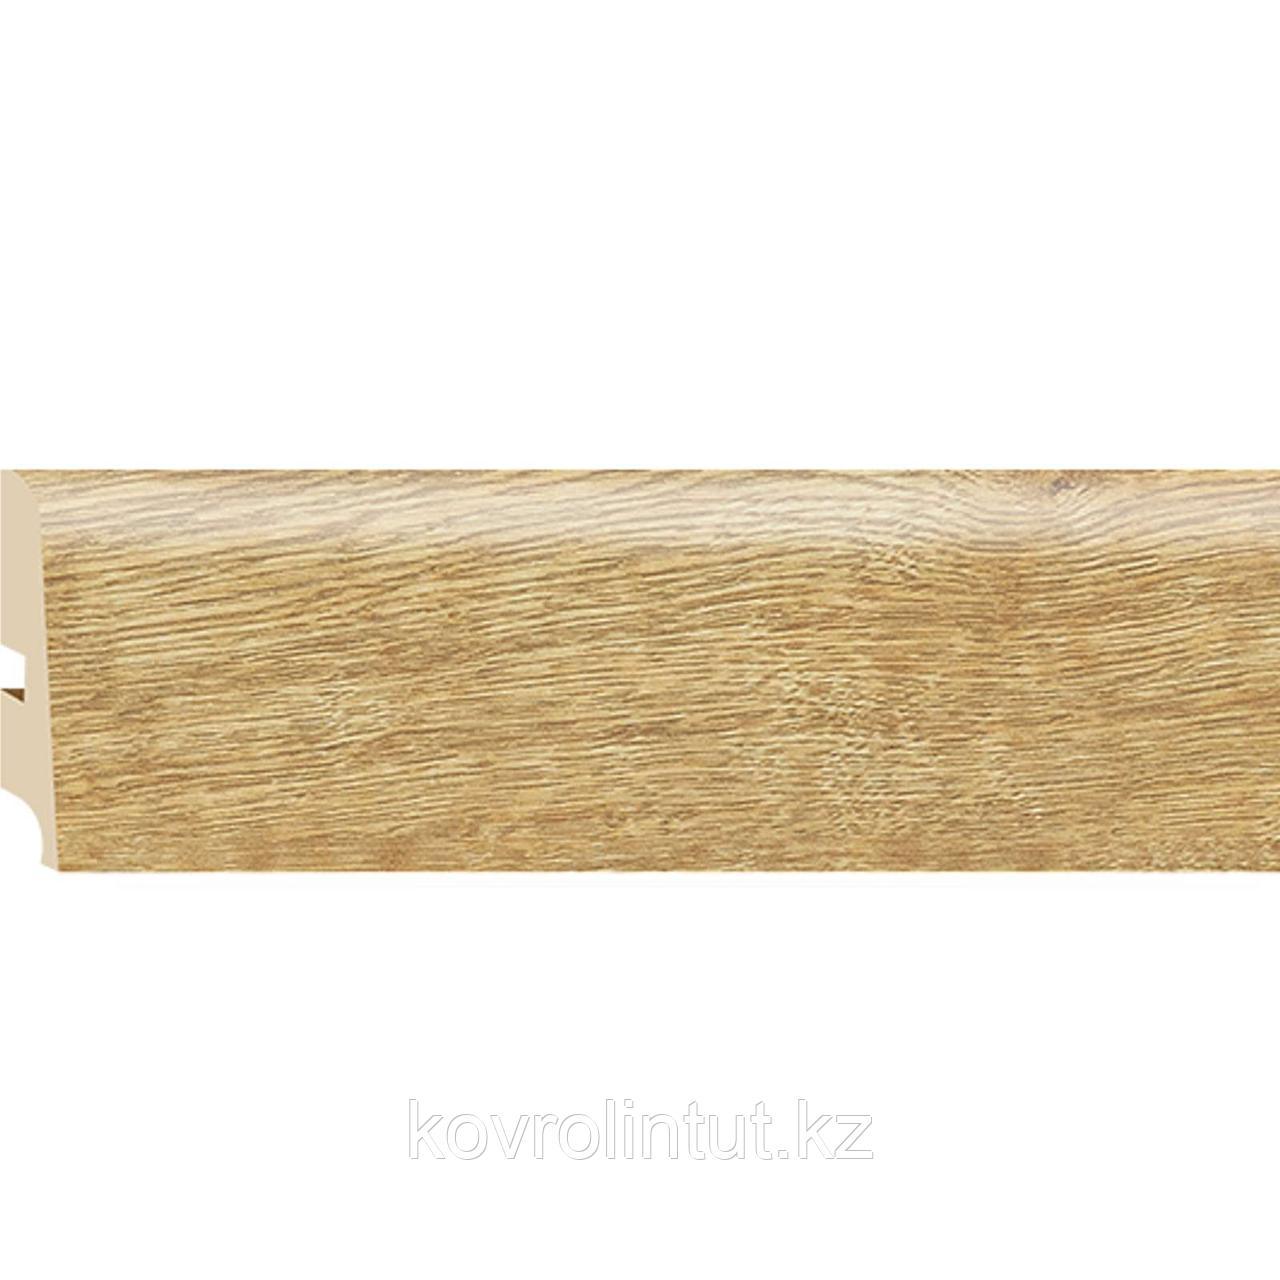 Плинтус Kronopol P85 4582 Oskar Oak, 2500х85х16мм, 9шт/уп